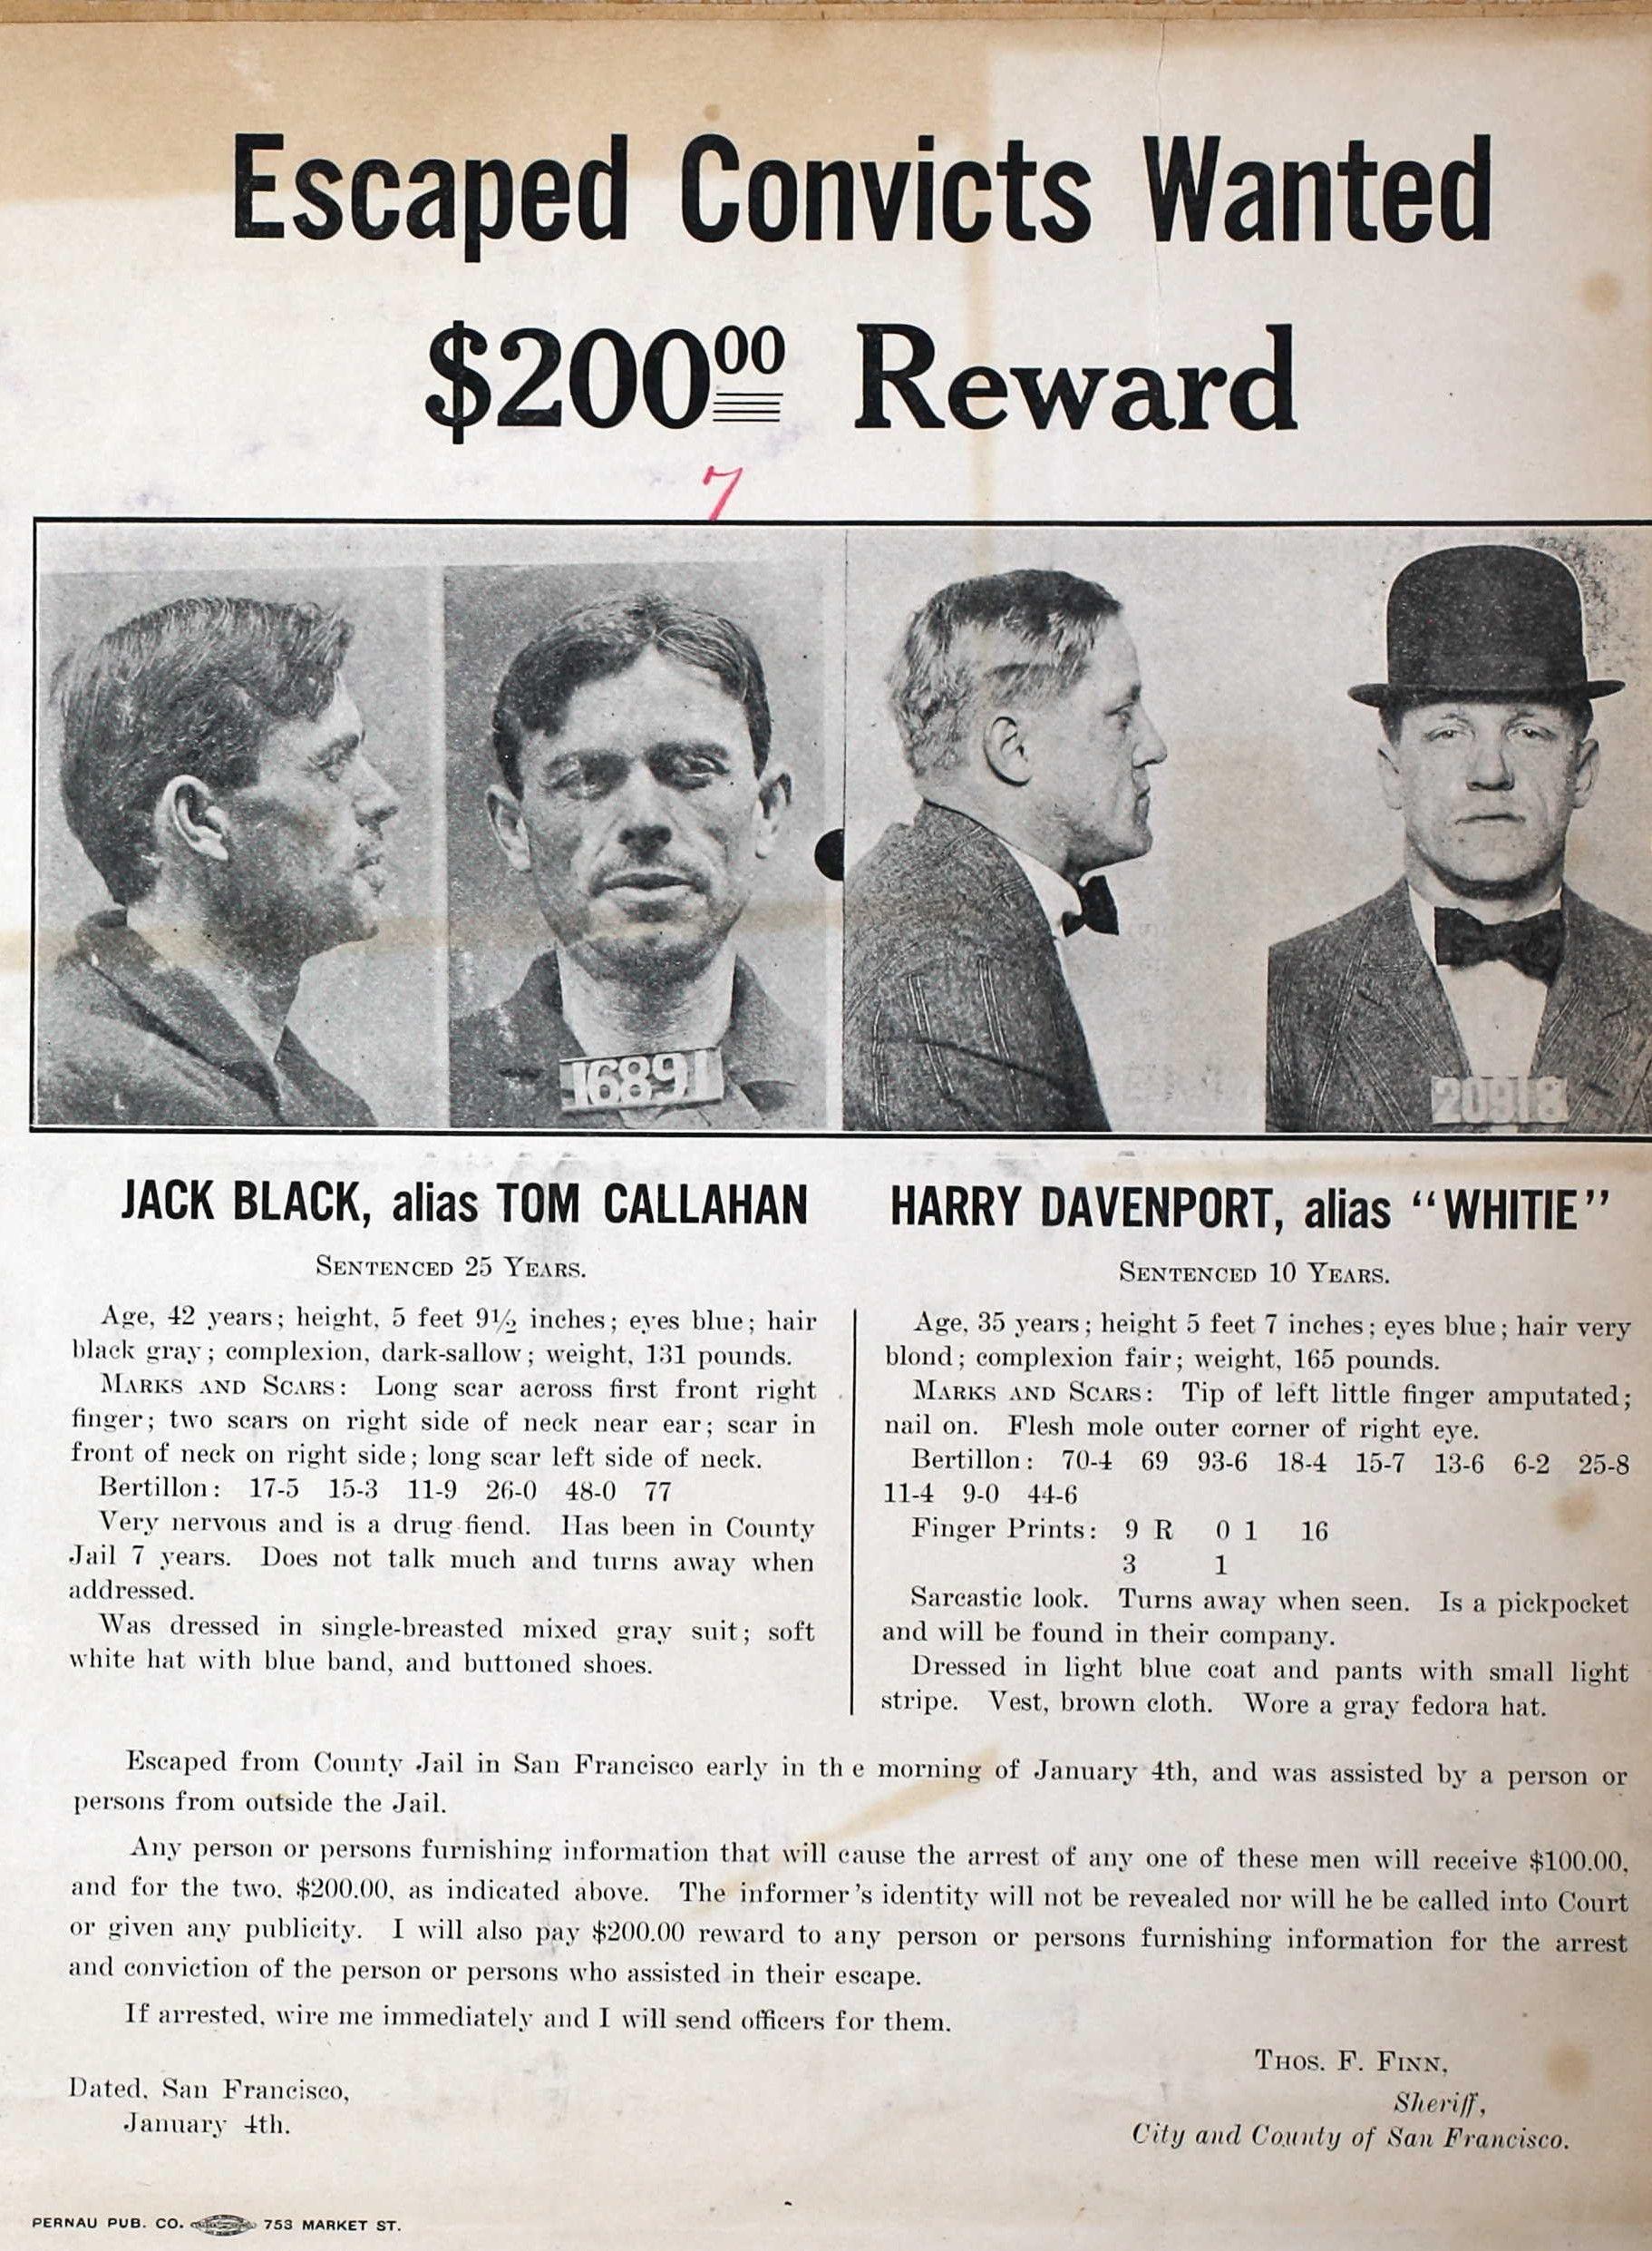 Jack Black & Harry Davenport Wanted Poster